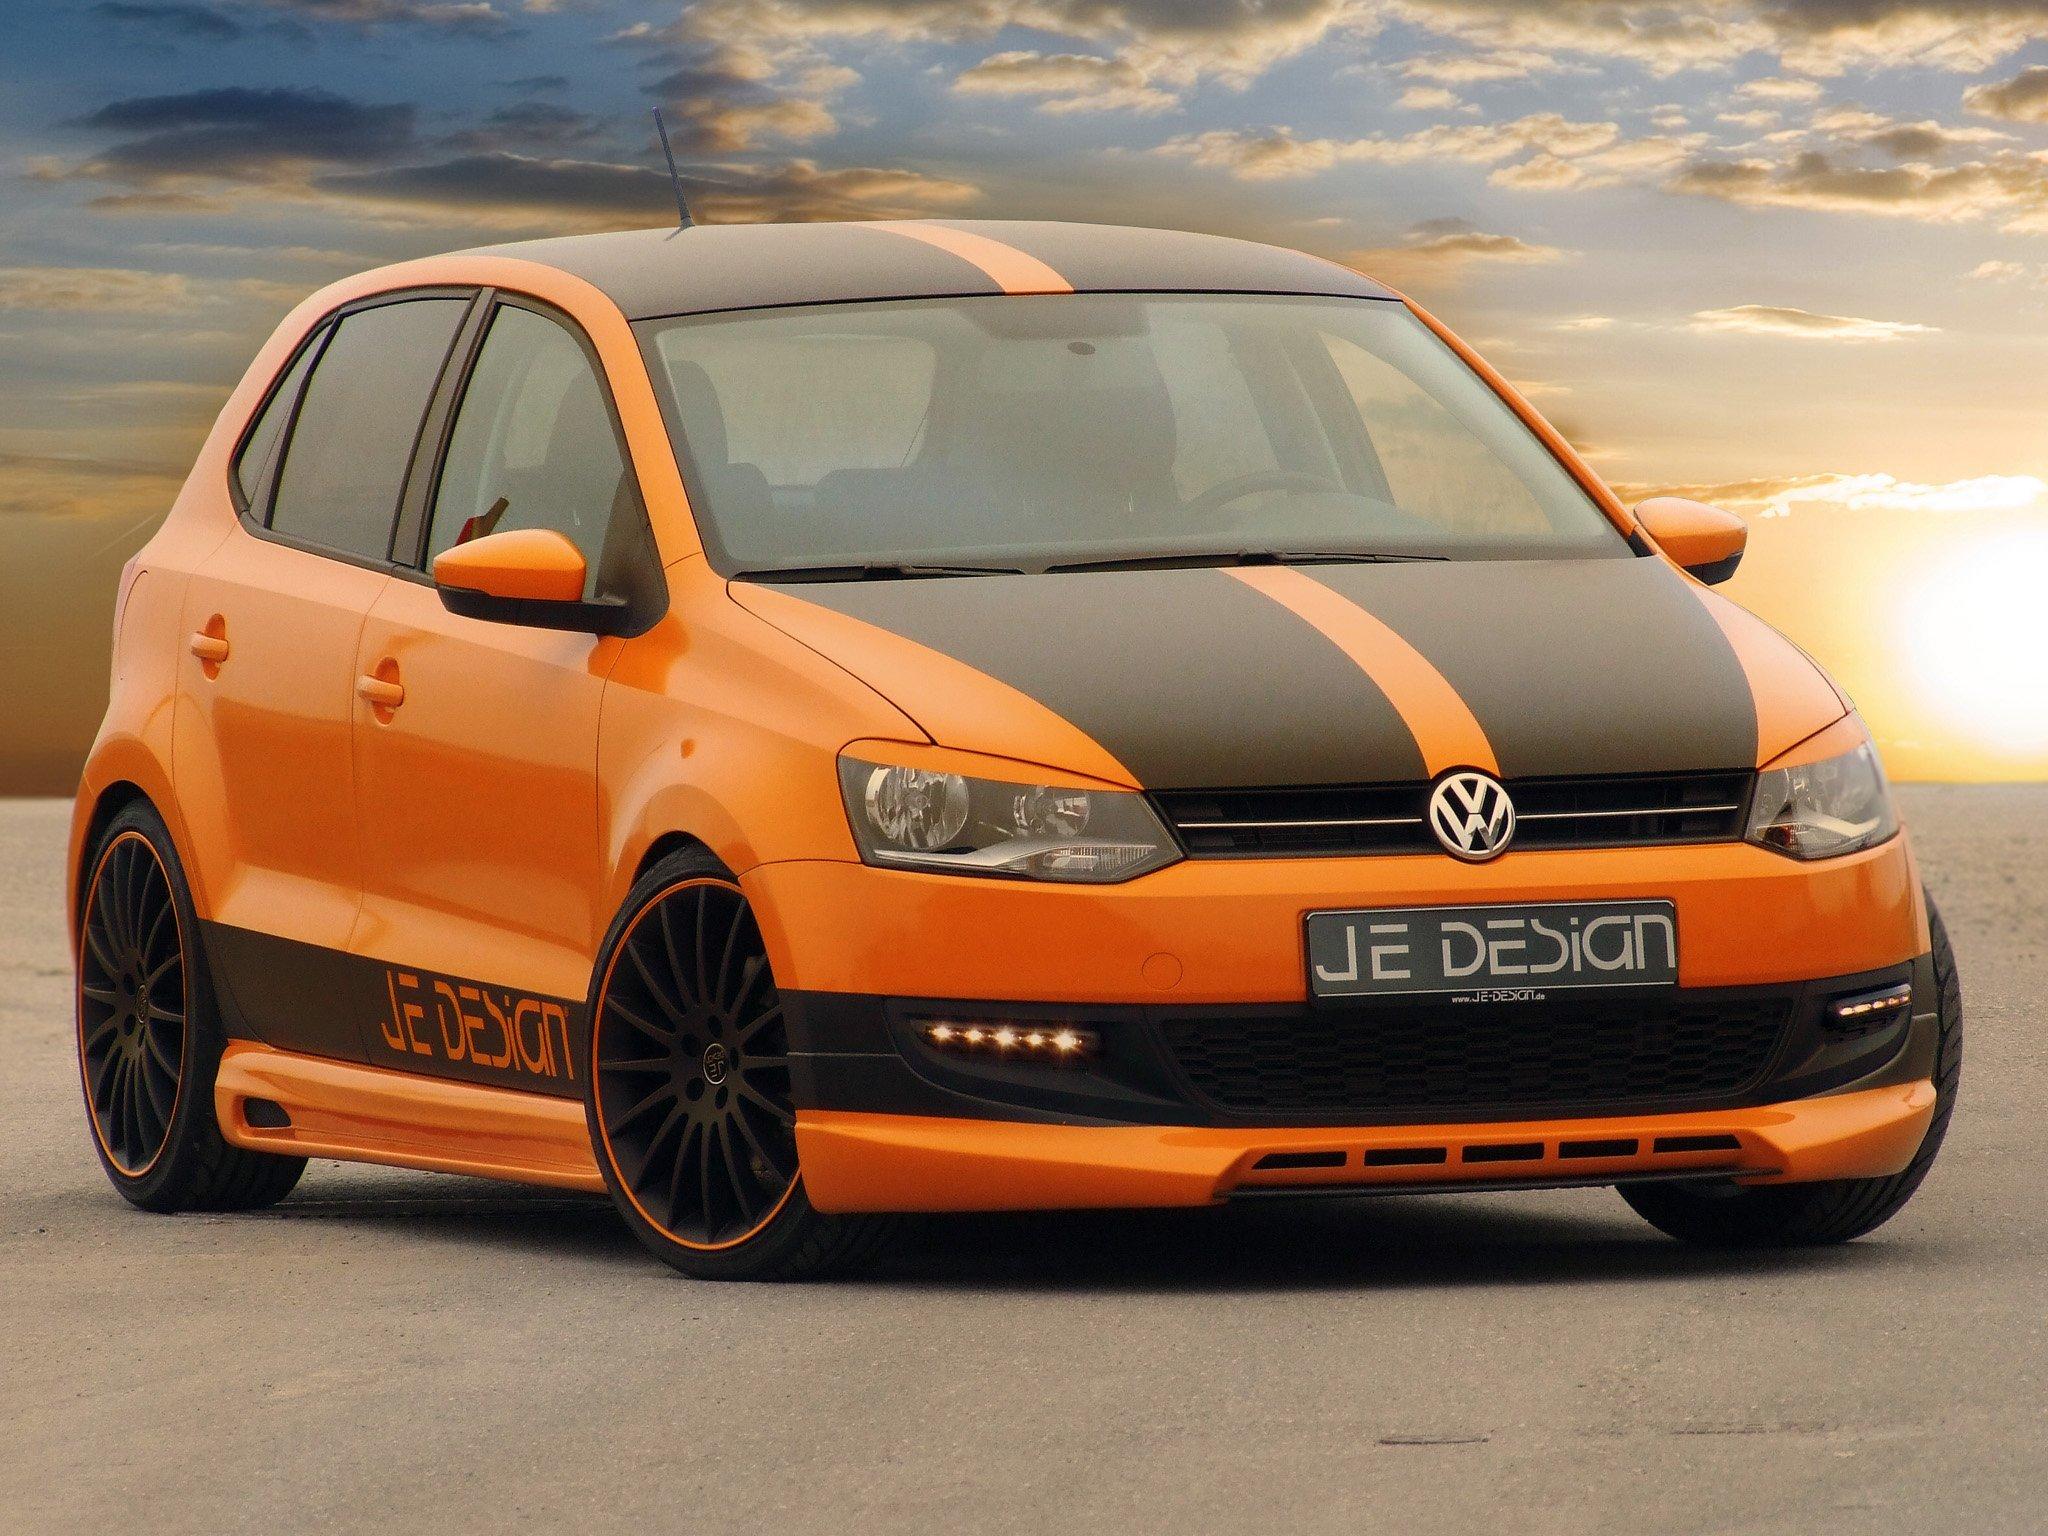 Volkswagen polo 2010 model araba resimleri - Je Design Volkswagen Polo 5 Door Cars Modified 2010 Wallpaper 2048x1536 745000 Wallpaperup